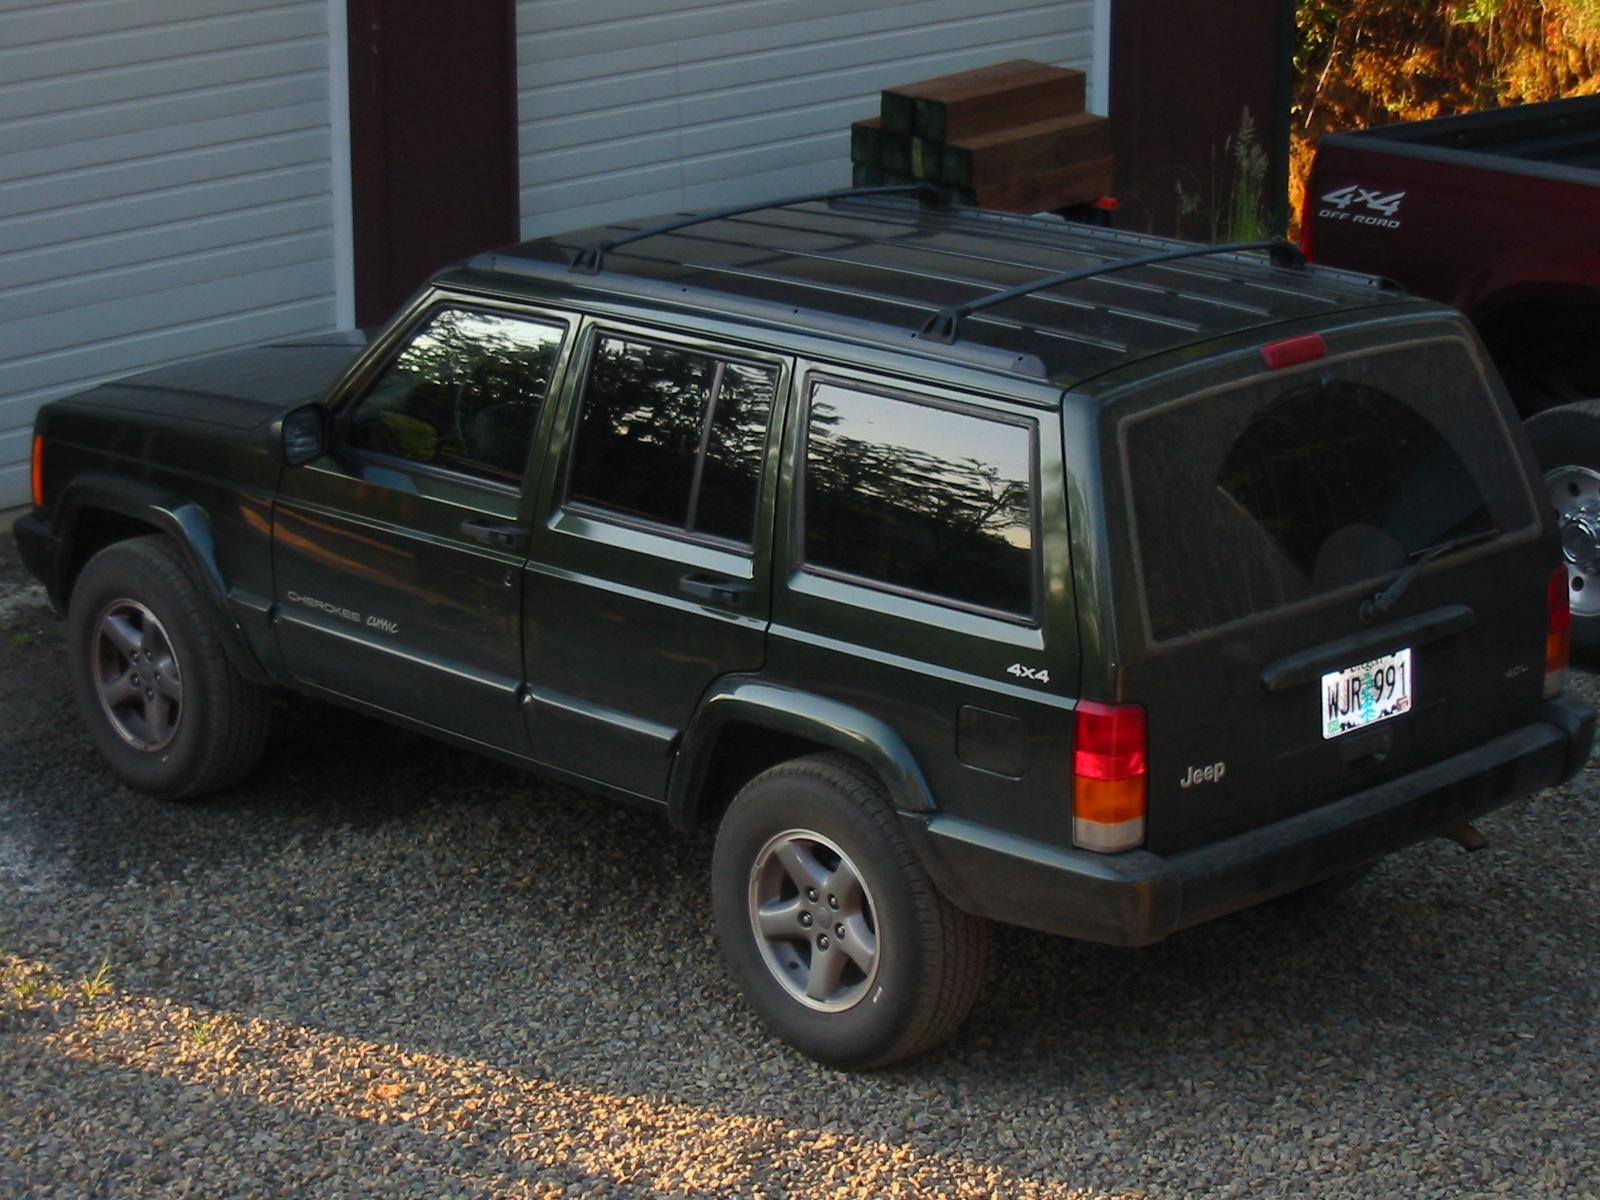 1998 jeep cherokee classic by marko